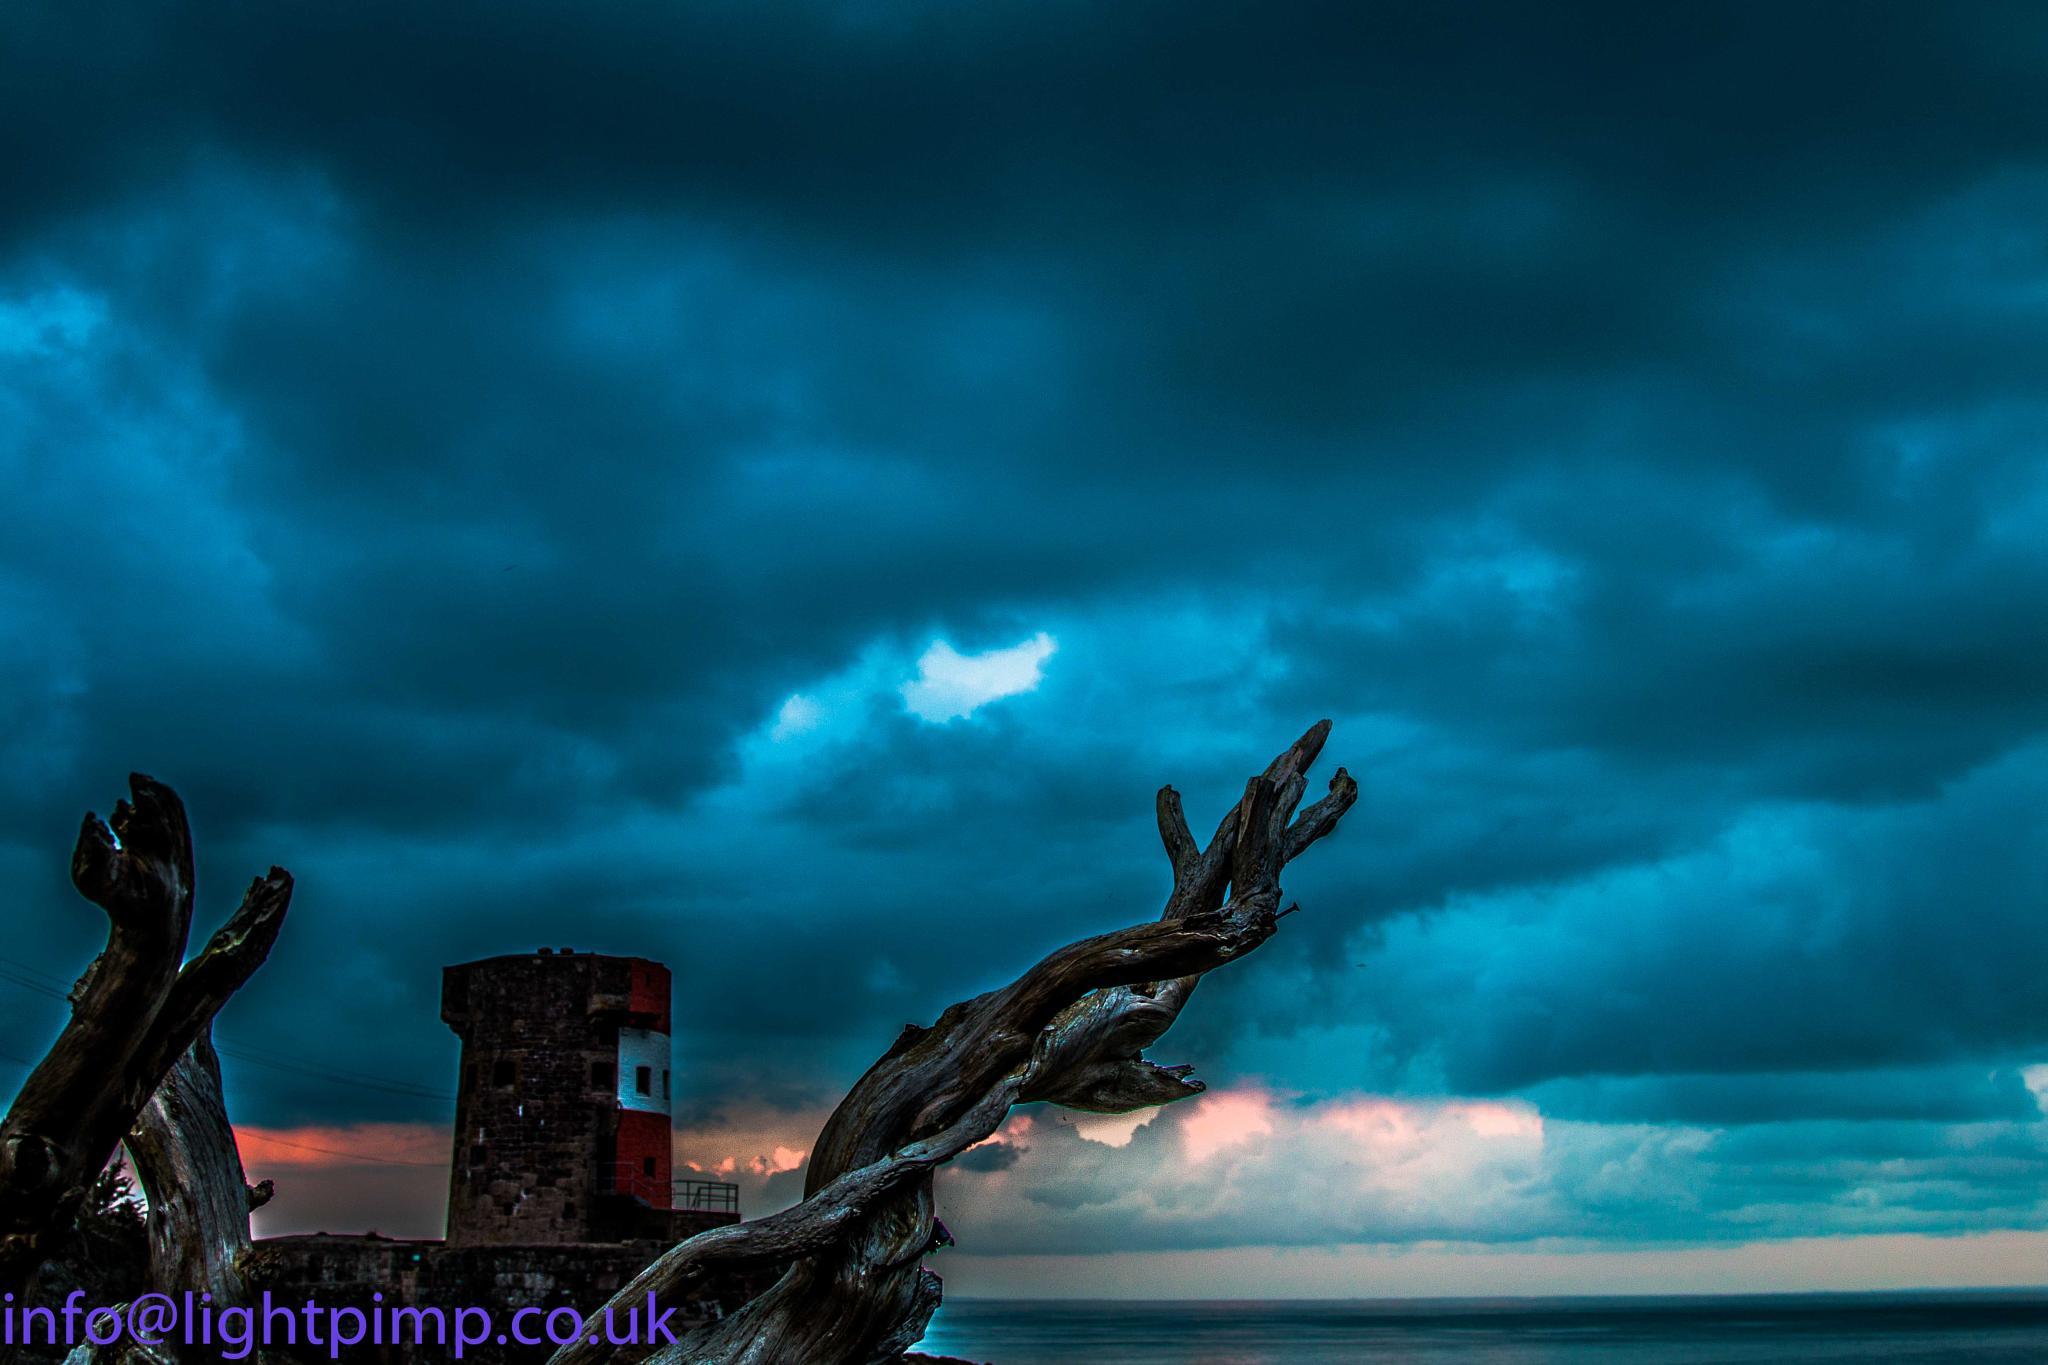 Archirondel Sunset by Lightpimp - akadodjer